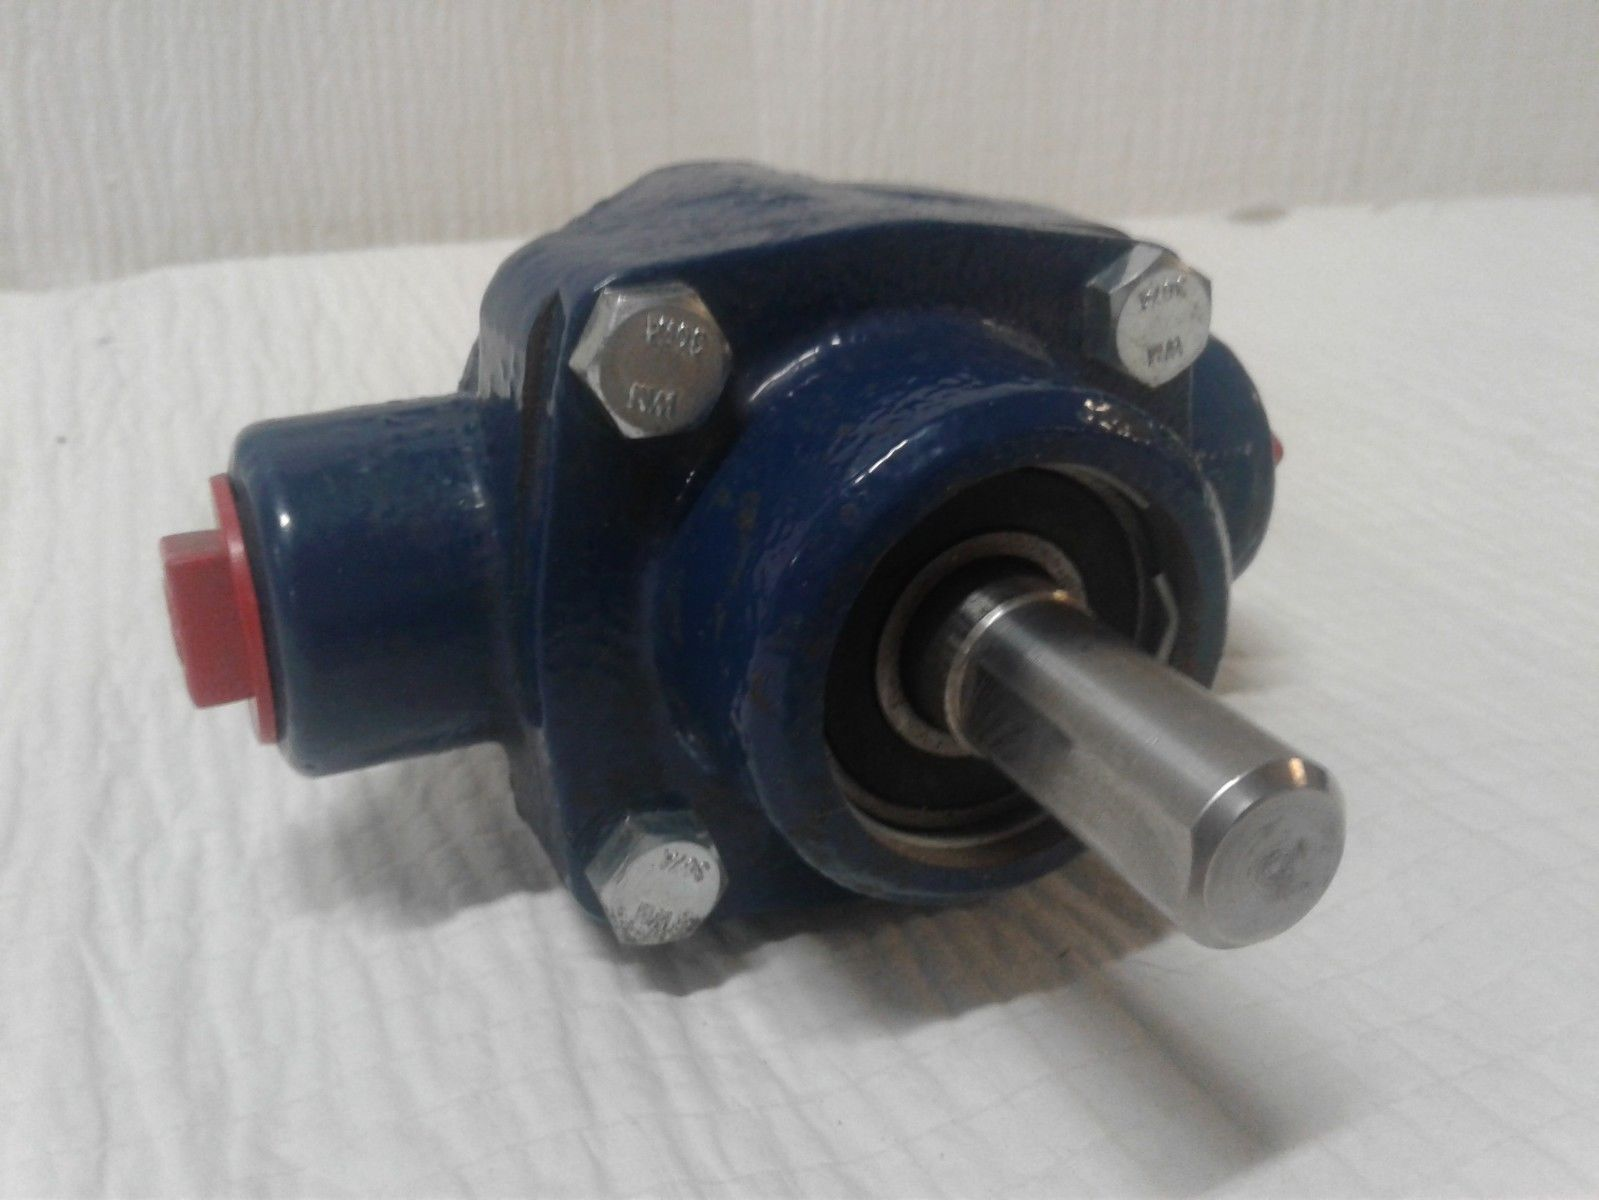 Model# 4900C 150 PSI Delavan Cast Iron 4-Roller Pump 2,600 RPM 9.2 GPM